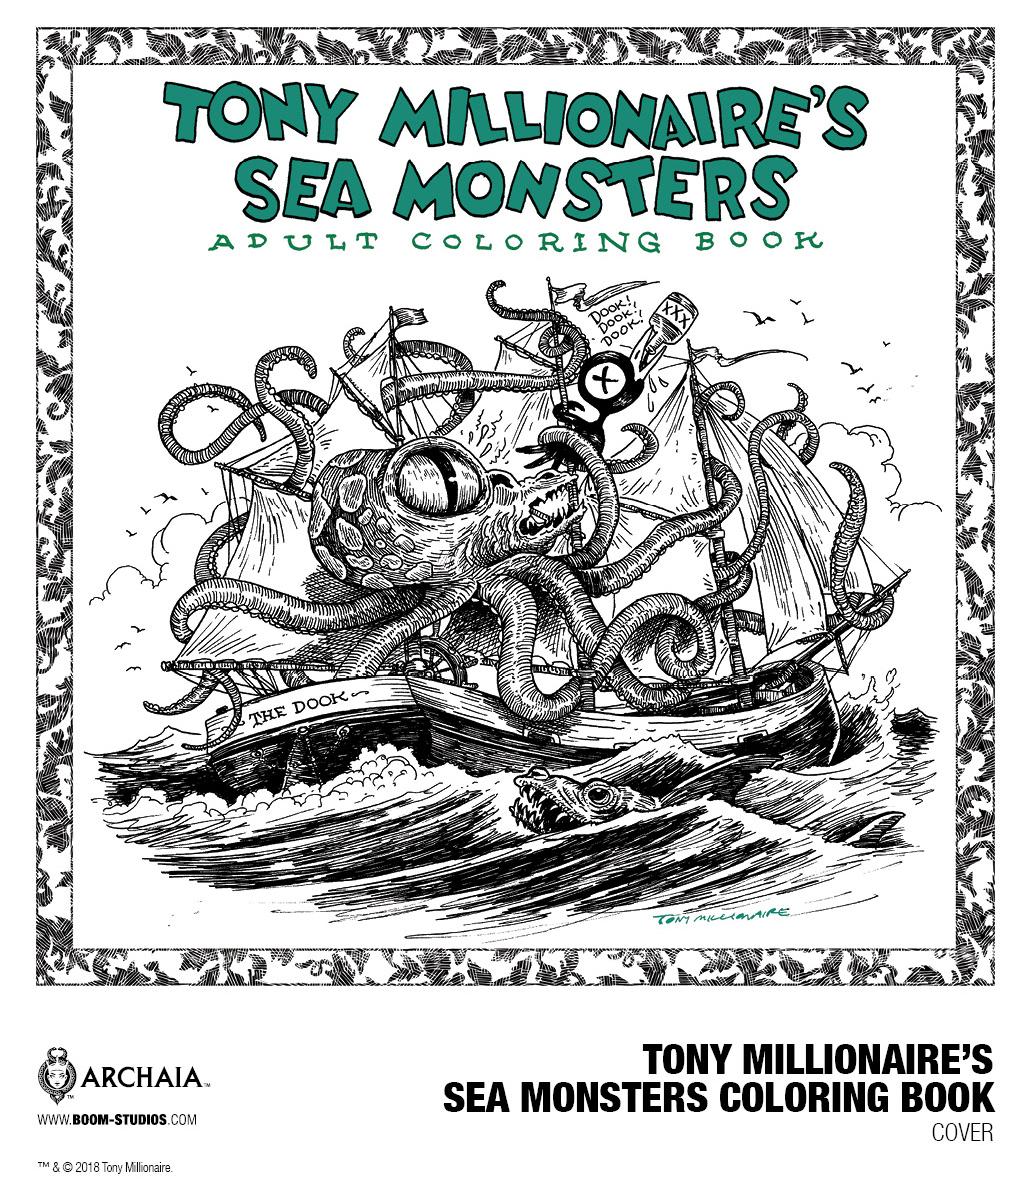 TonMillionaireColoringBook_SC_PROMO.jpg